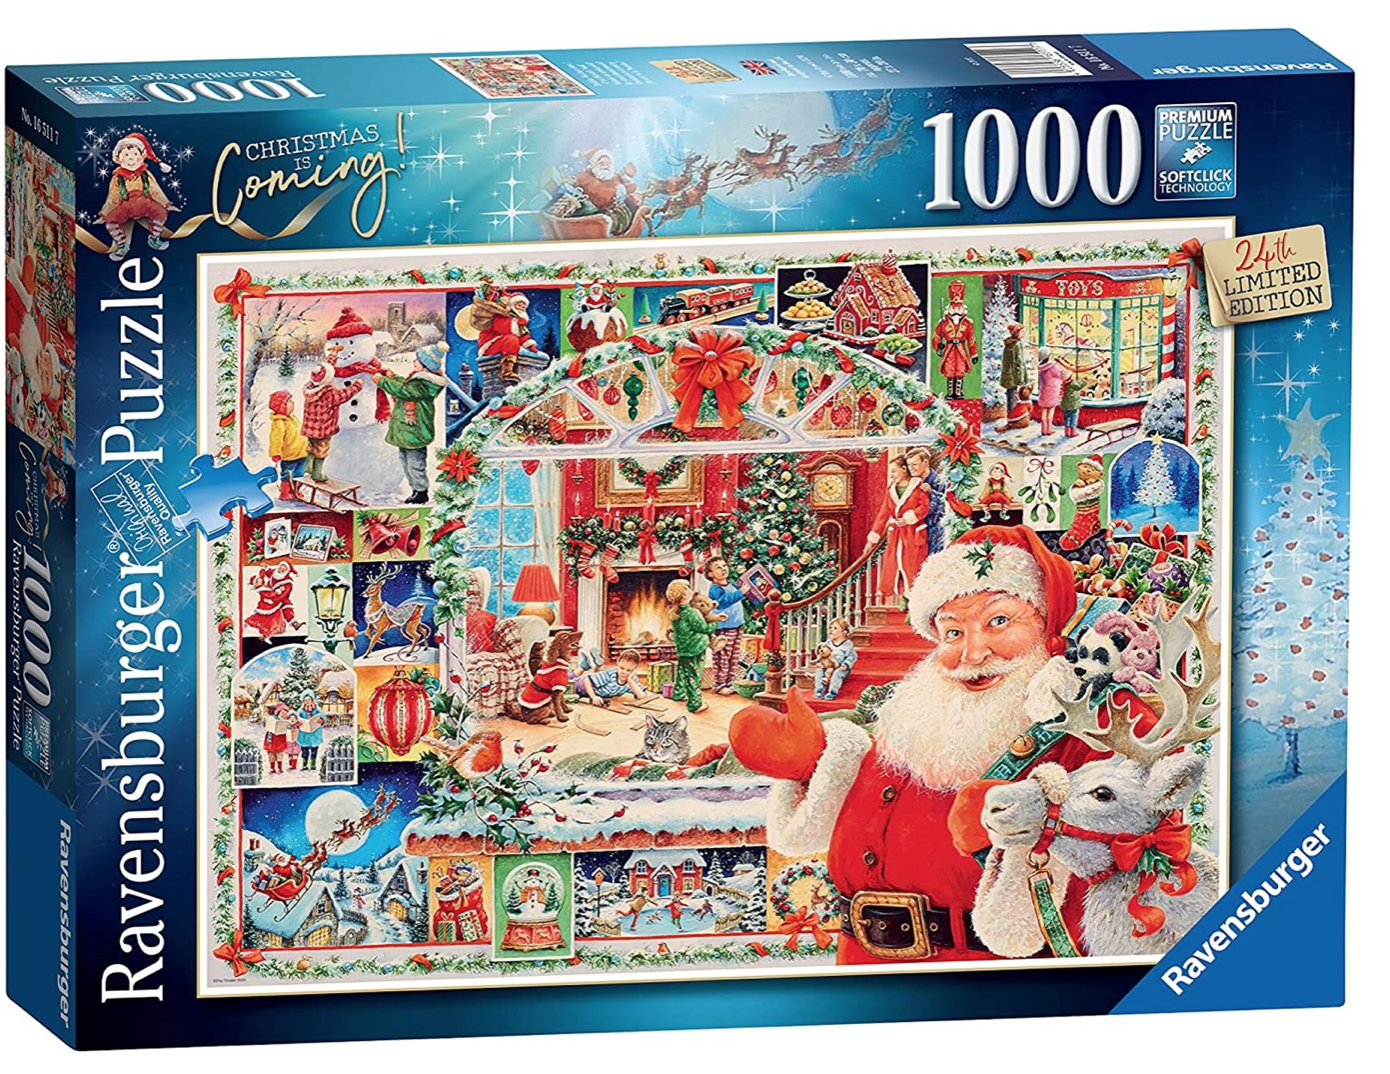 Ravensburger Christmas Puzzle 2021 Buying Cheap Ravensburger Puzzles Wide Choice Puzzles123